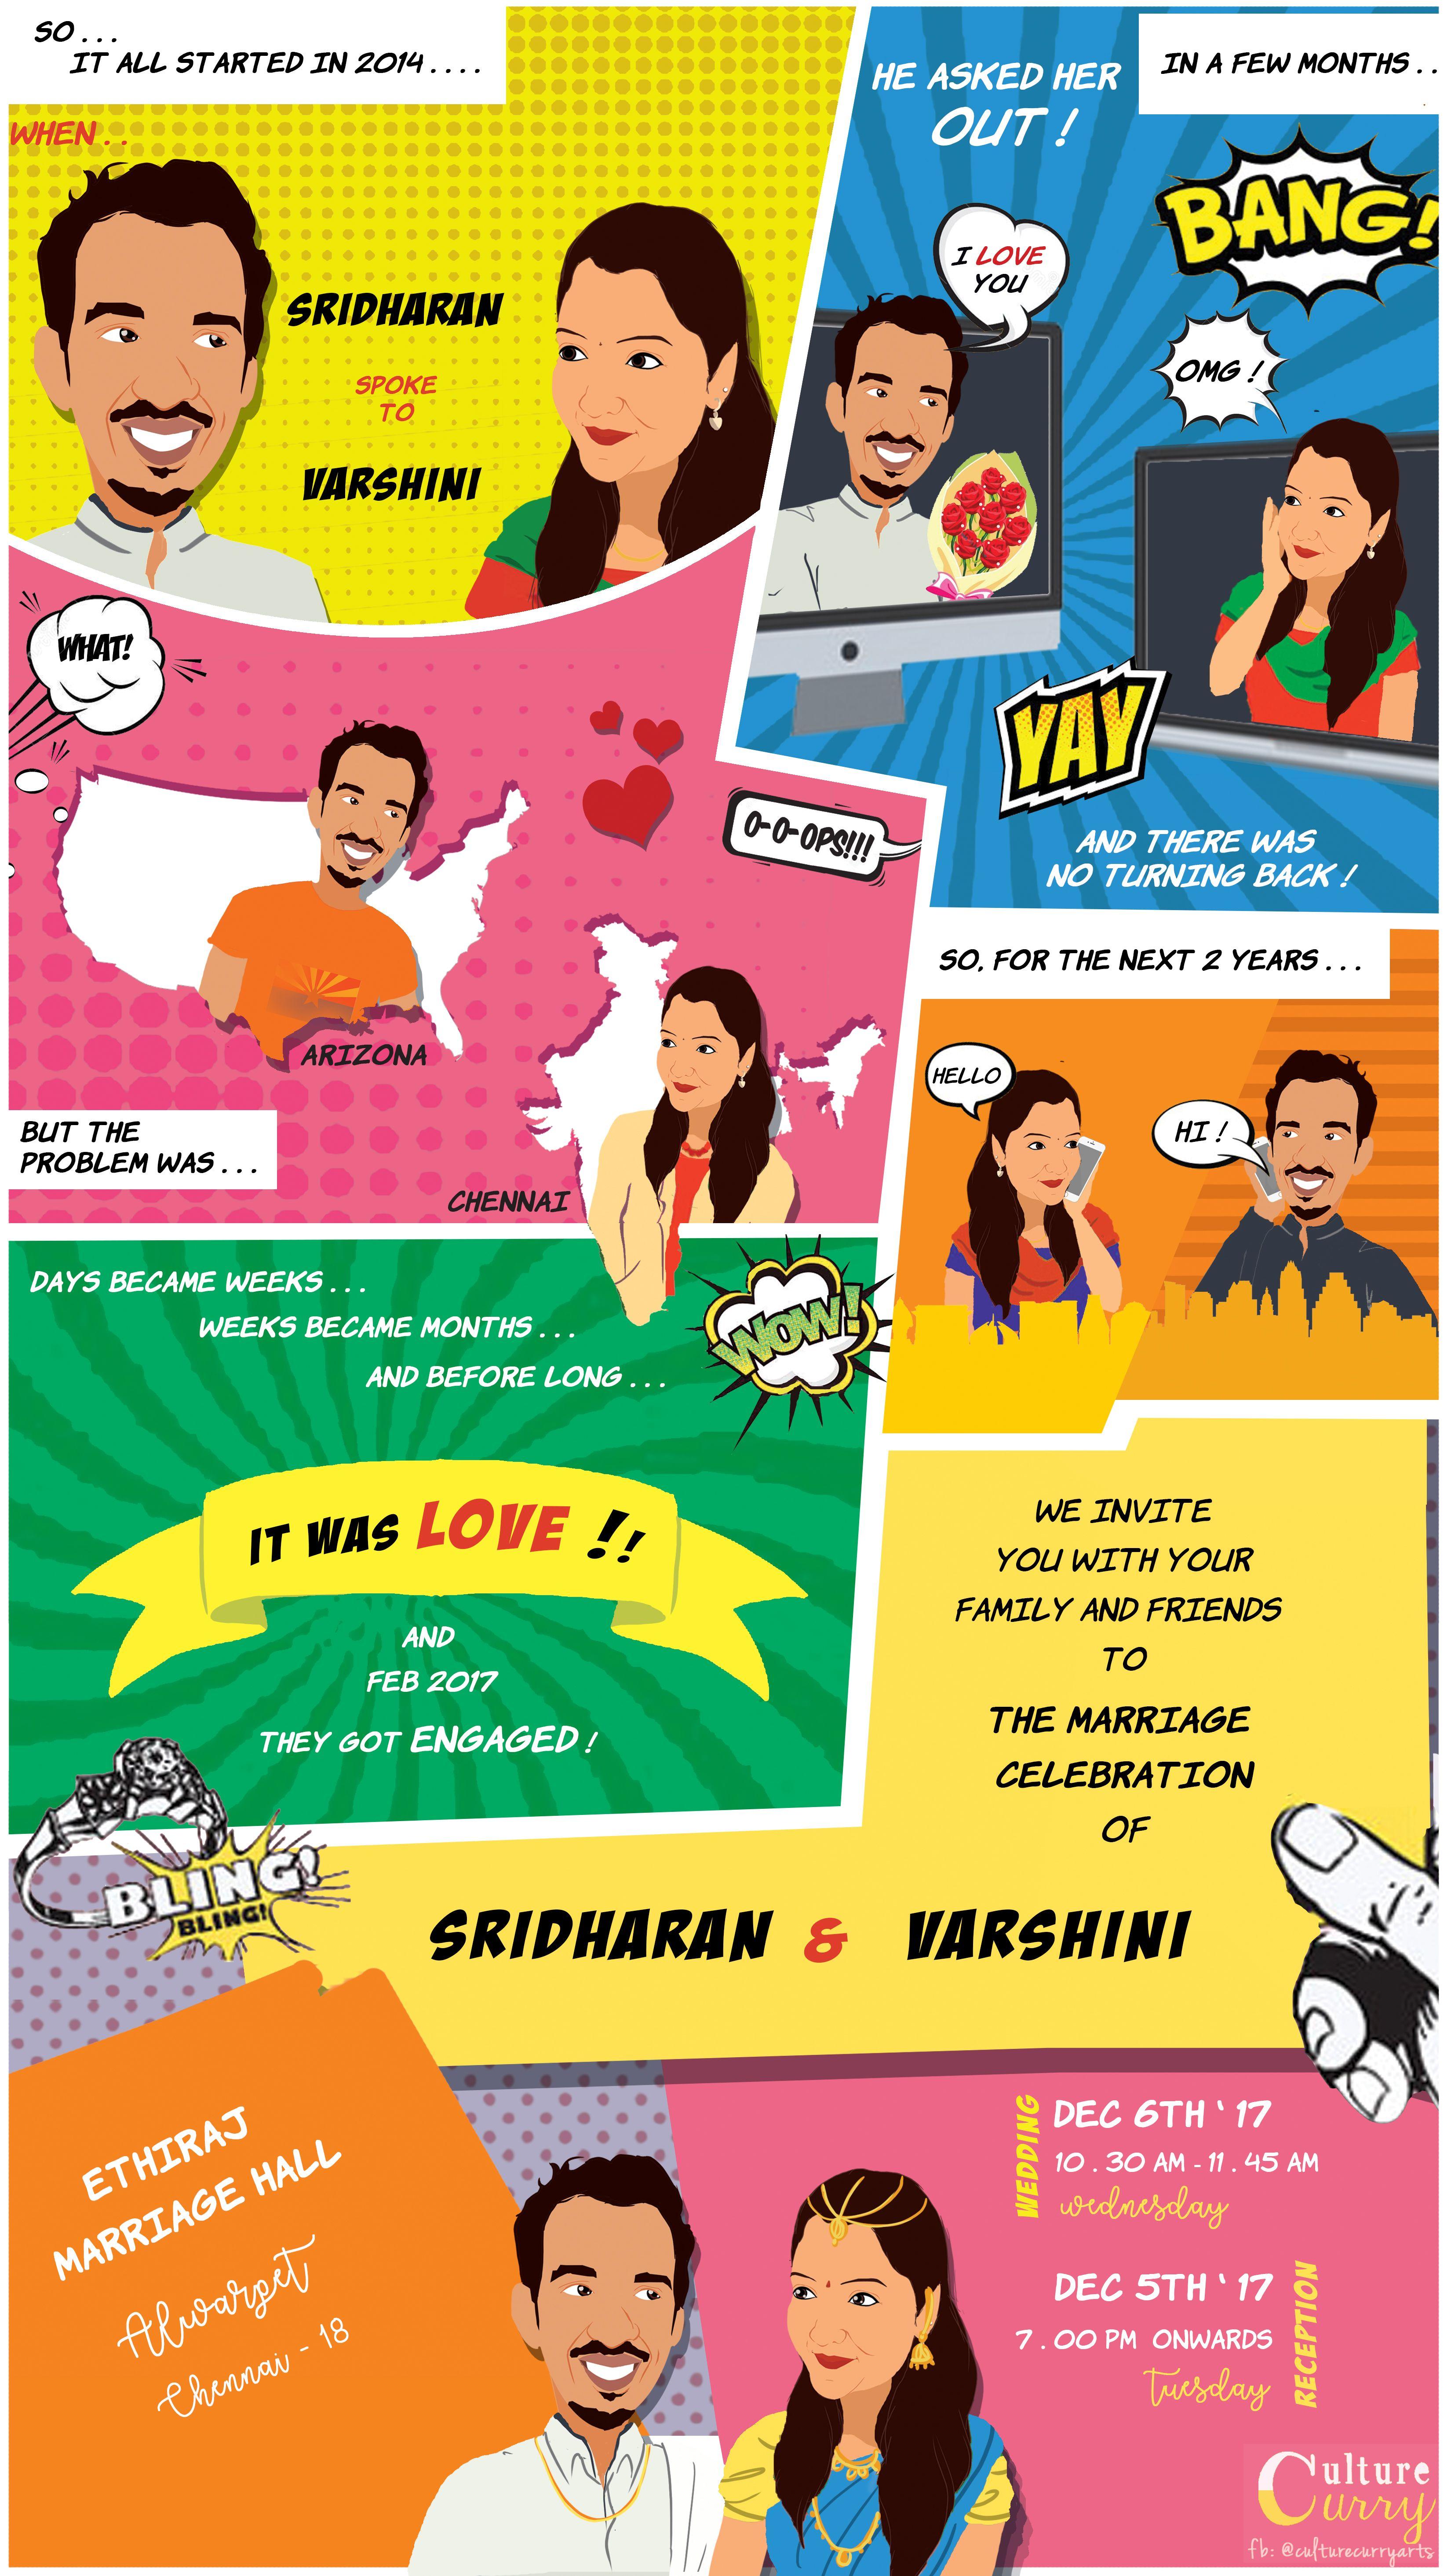 Comic Strip Indian wedding invite, cartoon caricature fun